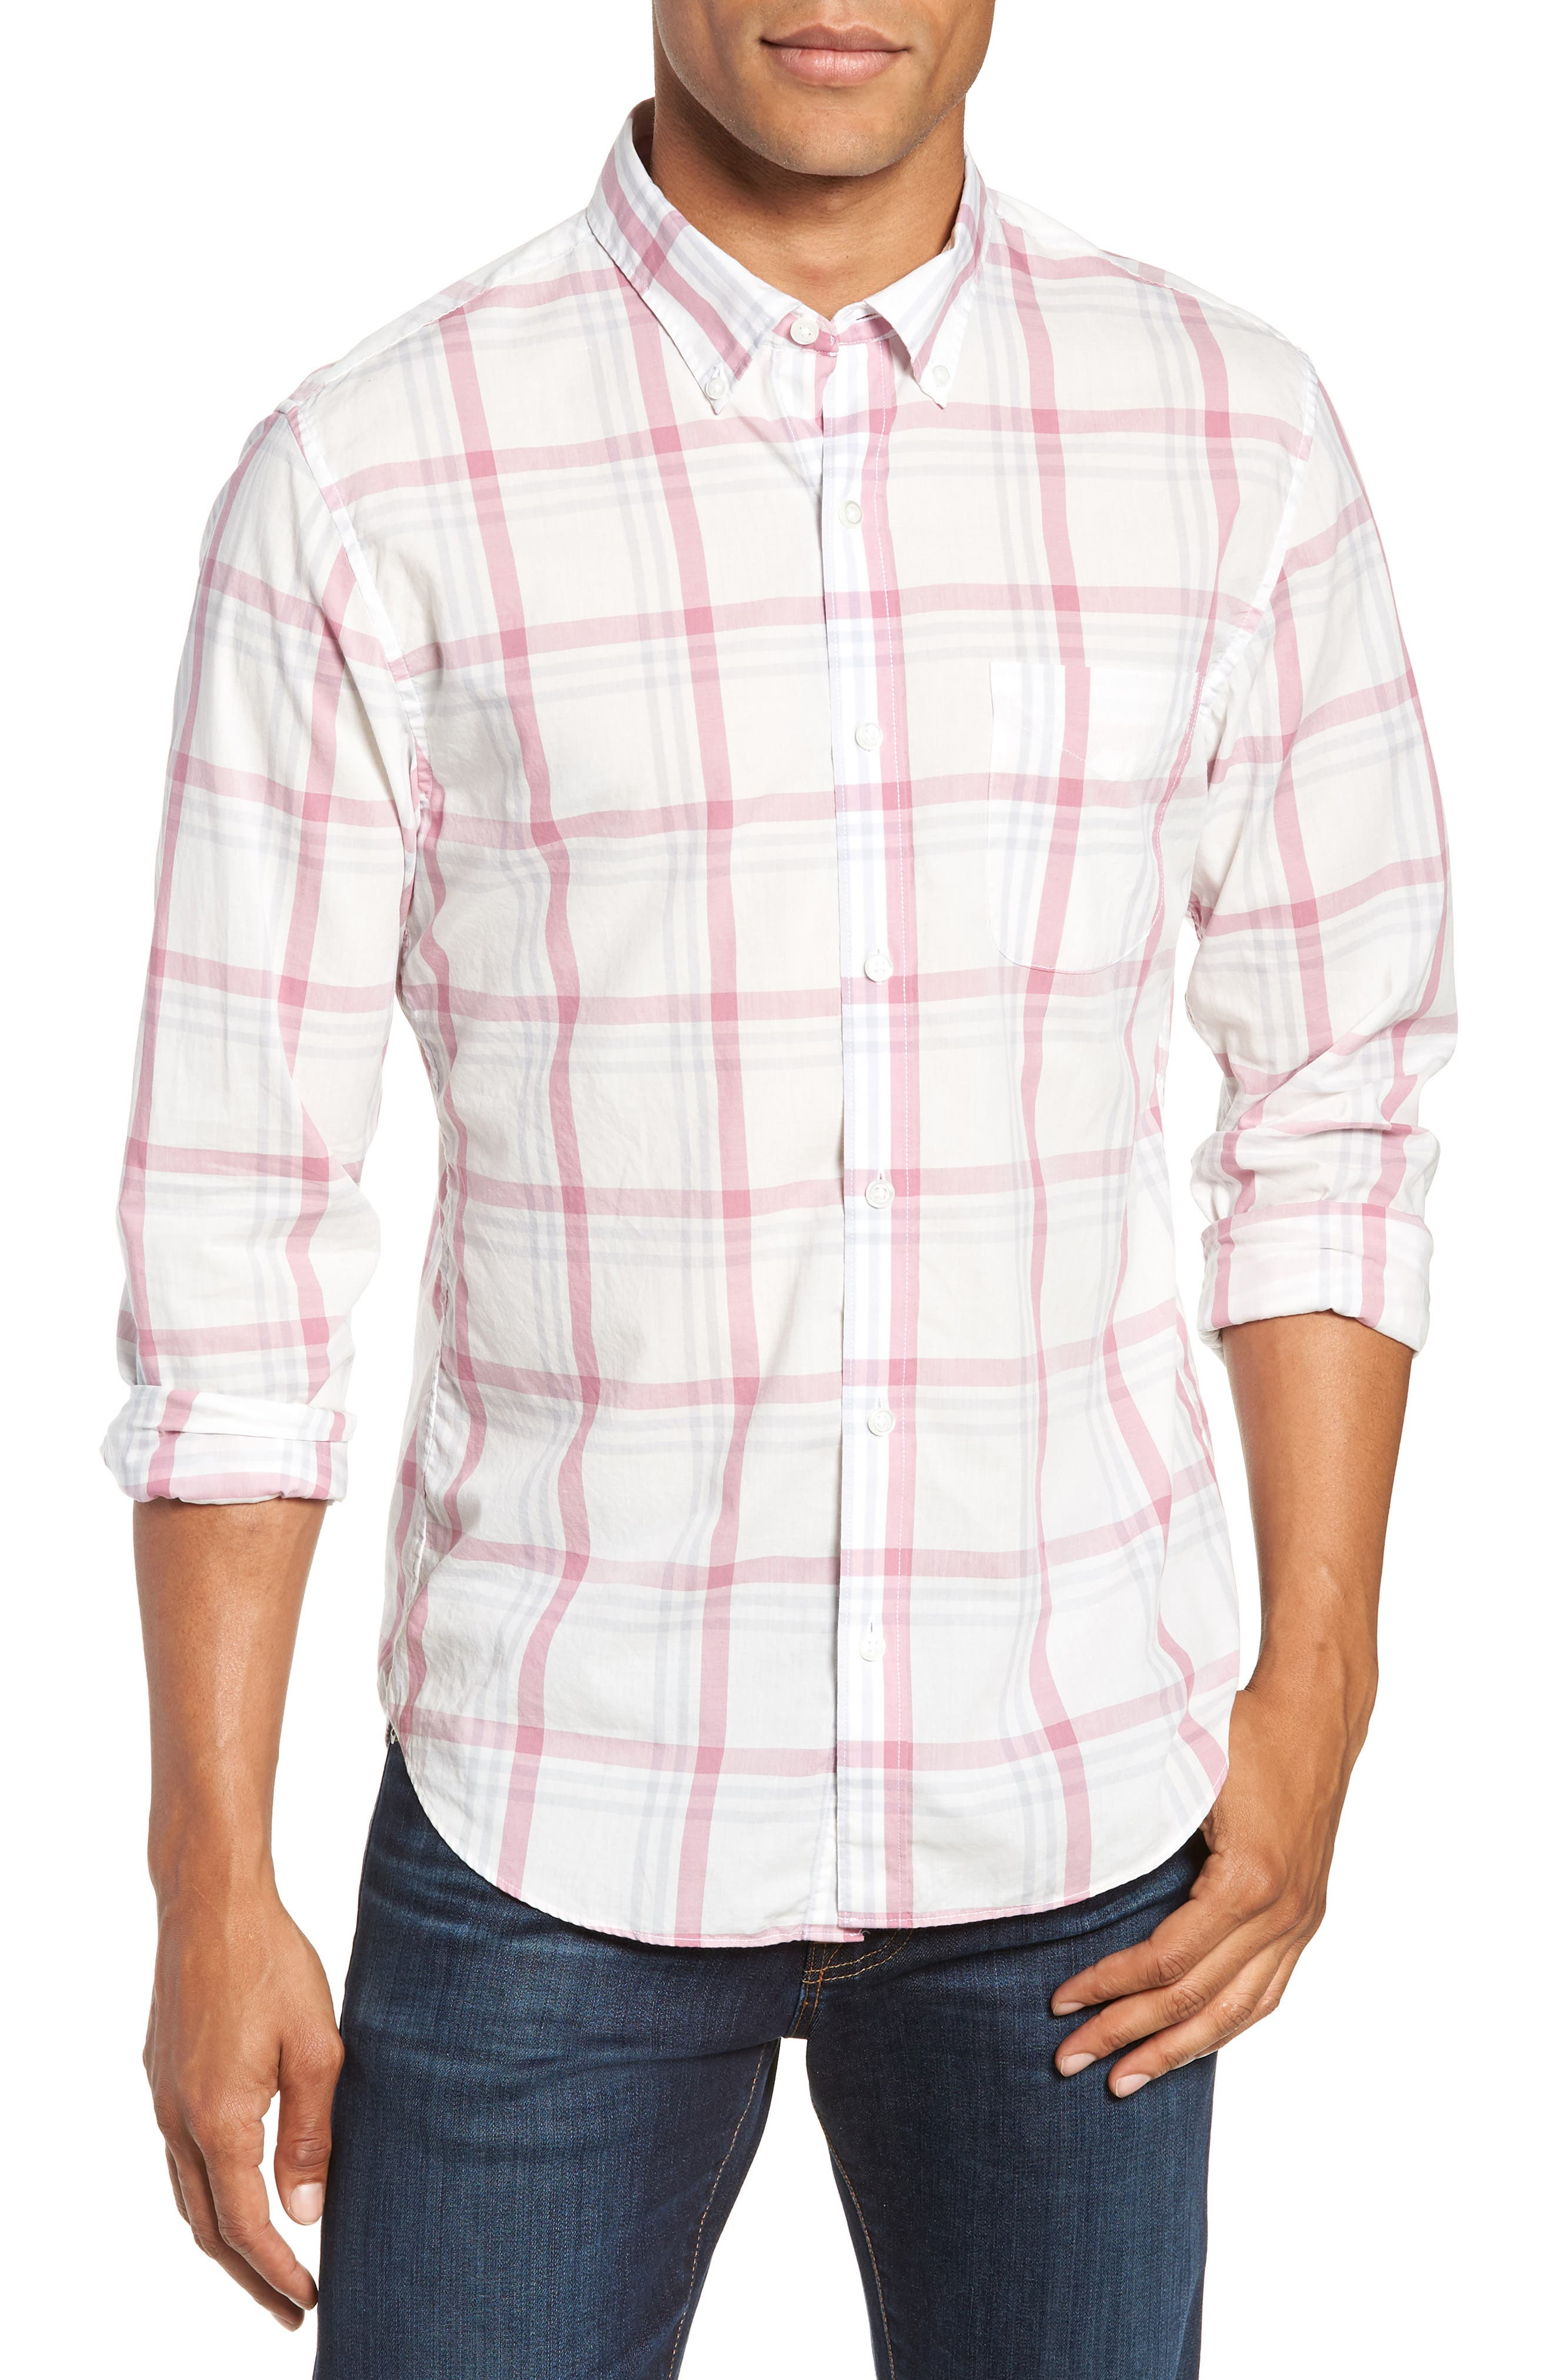 BONOBOS Summerweight Slim Fit Plaid Sport Shirt, Main, color, 100